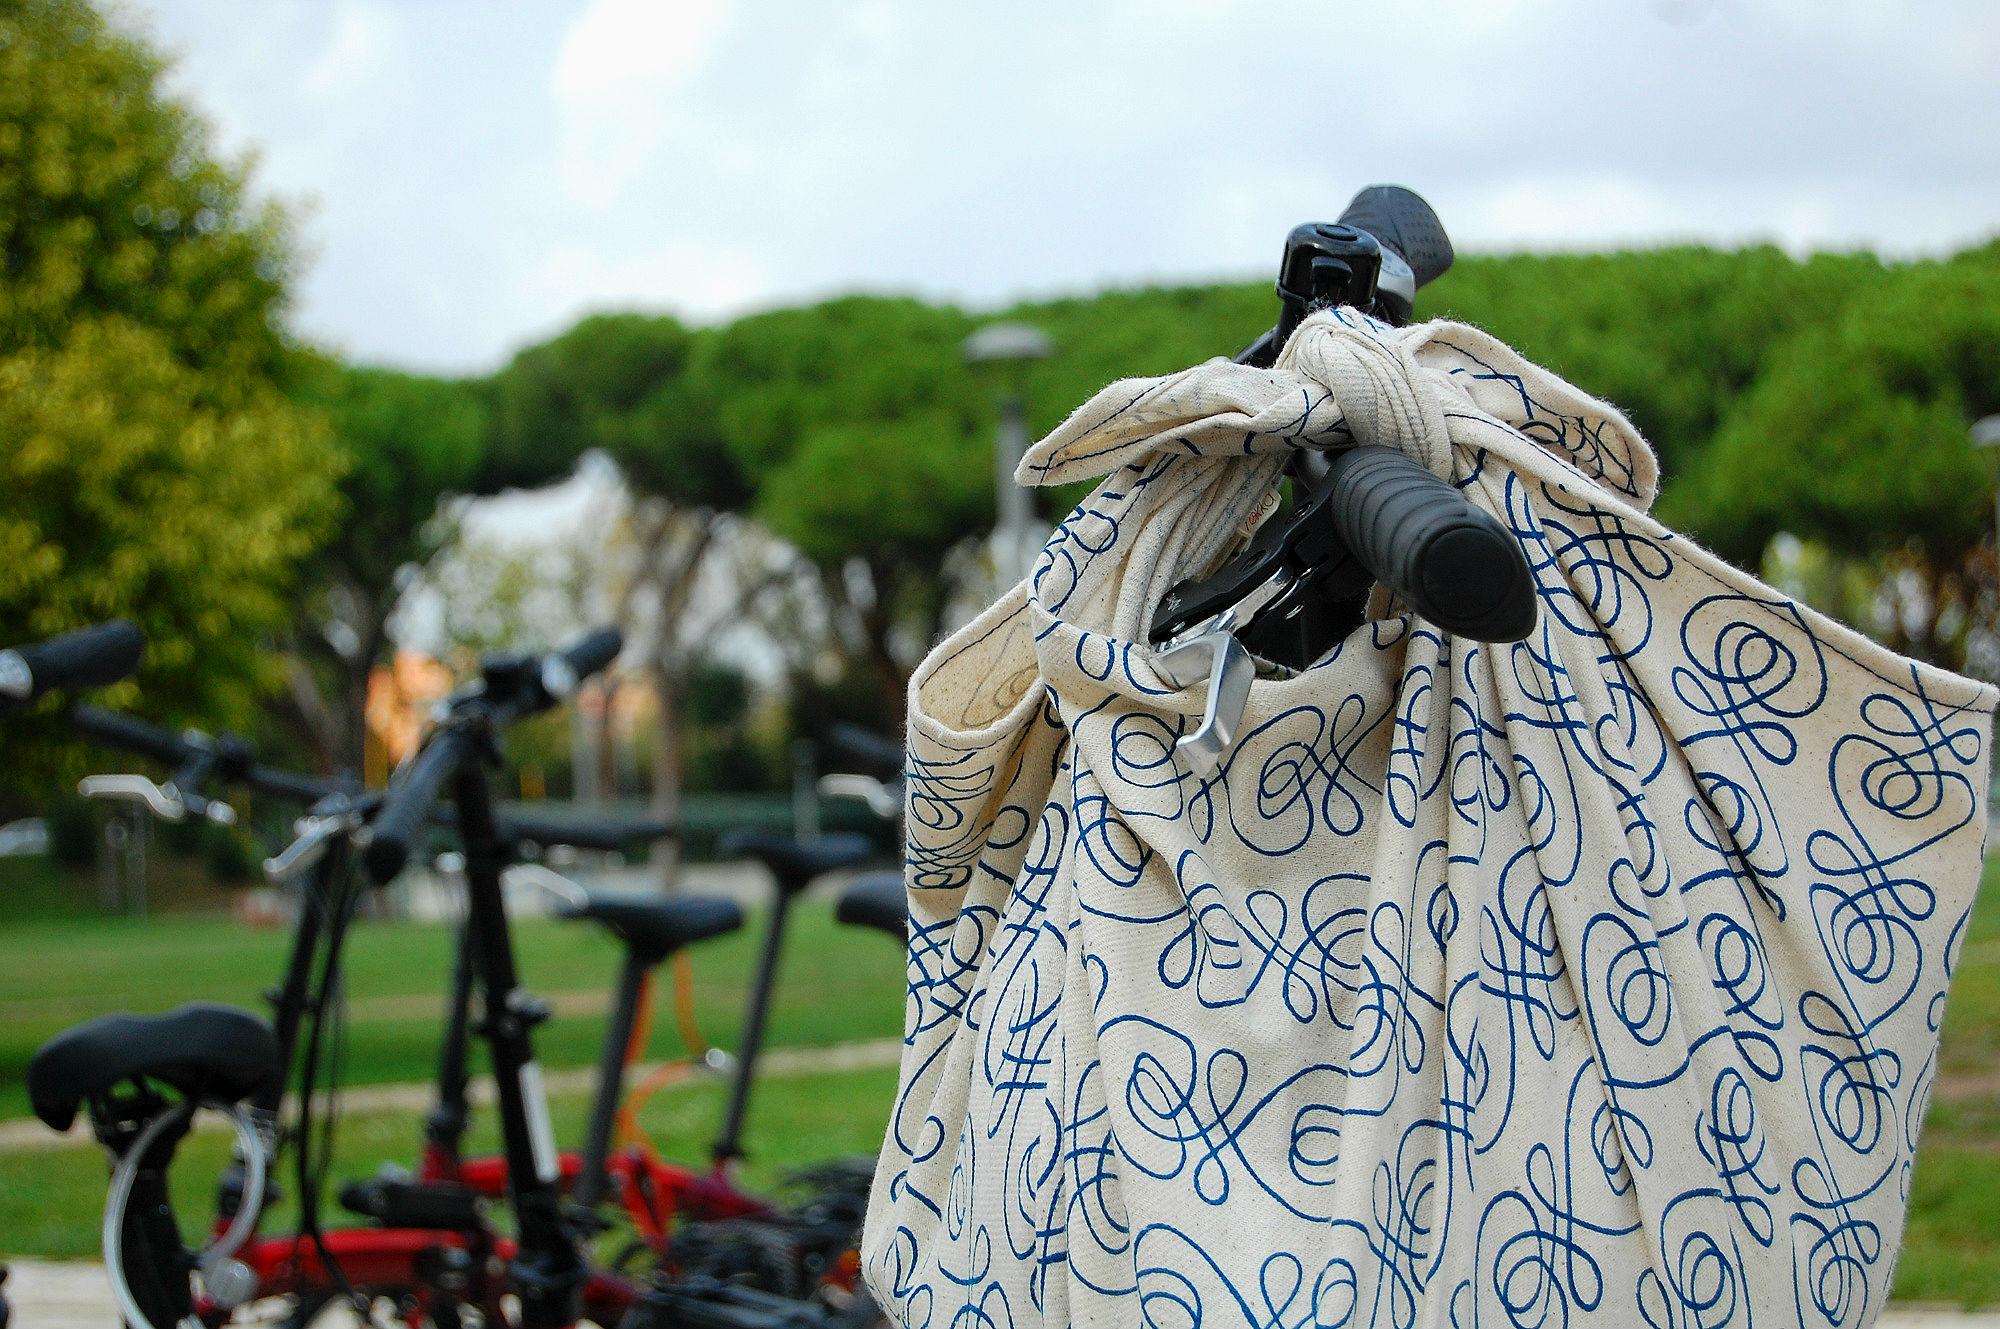 rokka_furoshiki_bike_bag.jpg